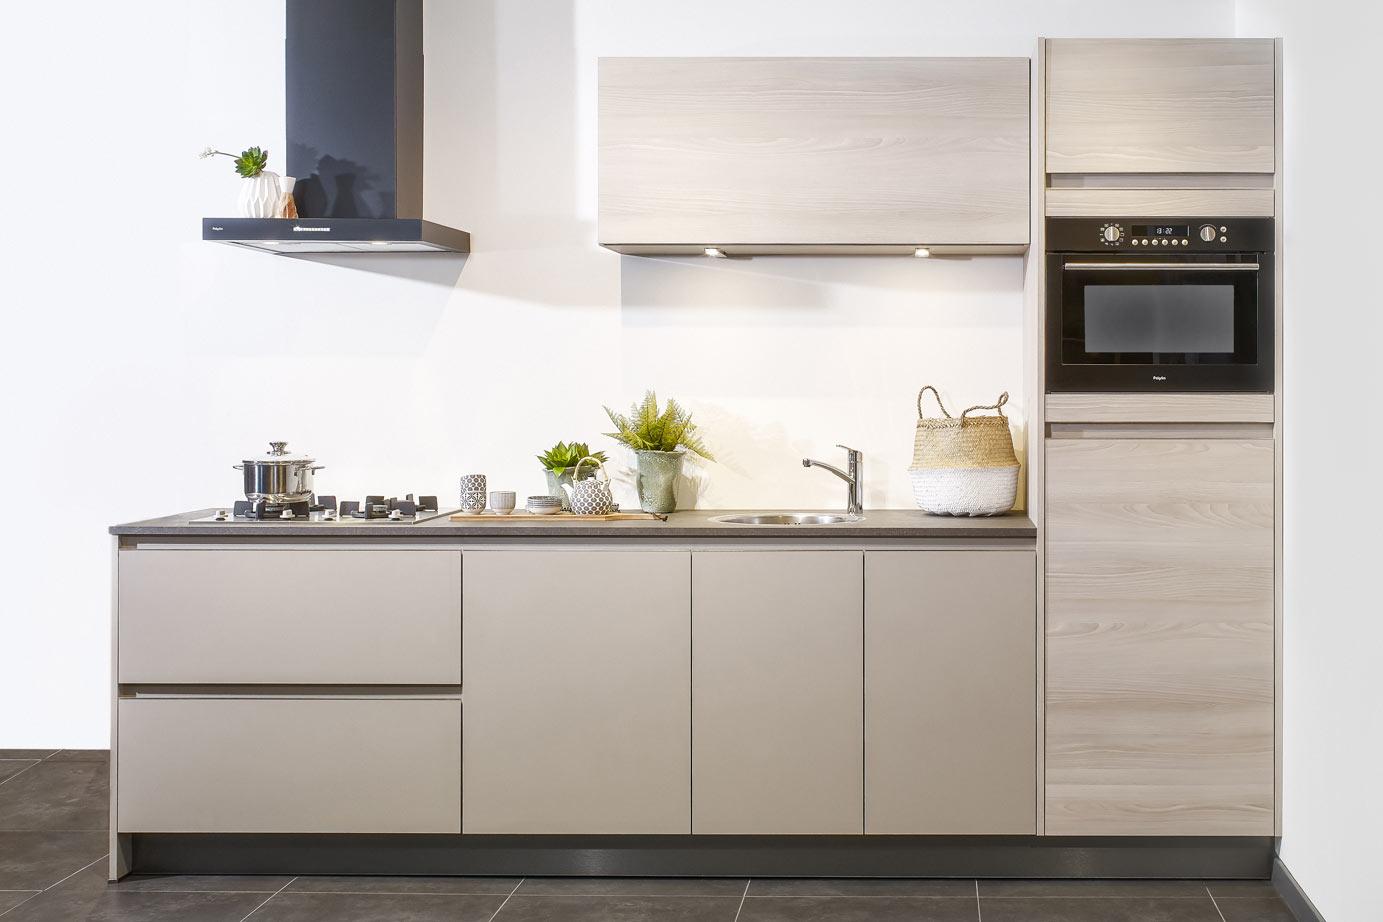 Keuken Moderne Klein : Kleine keuken in moderne stijl bekijk foto s en prijzen db keukens